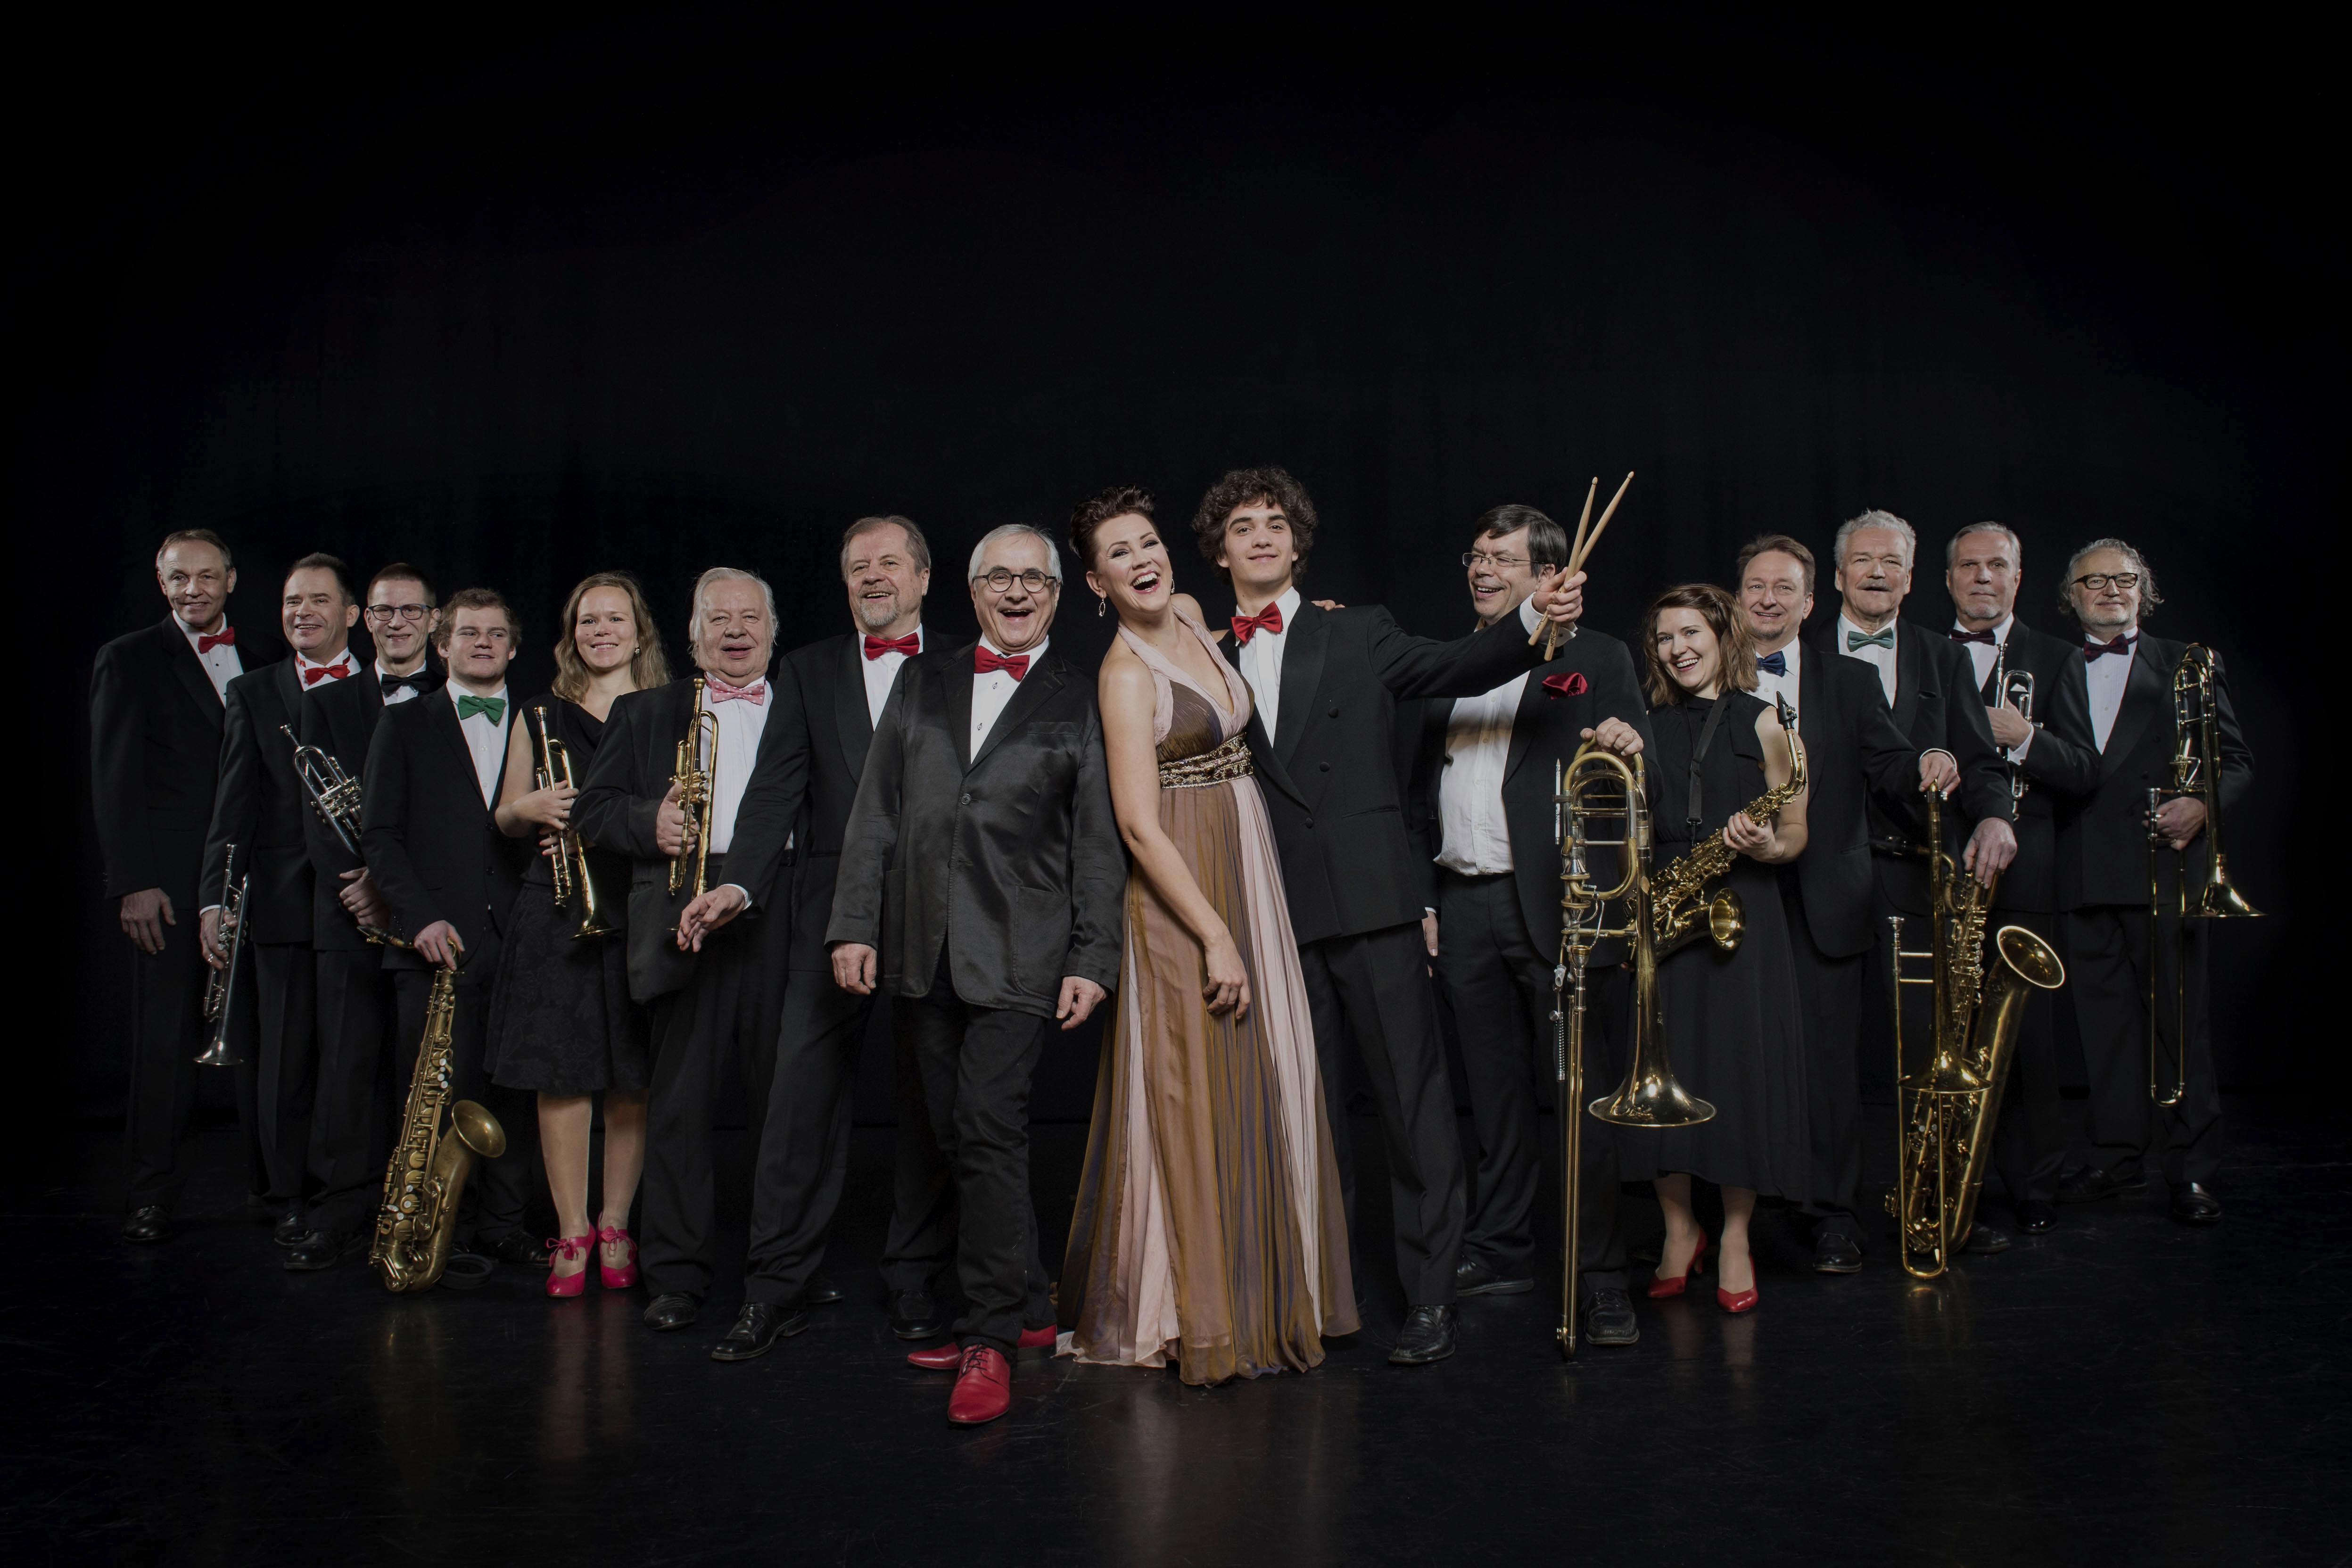 Mari Palo ja Tapiola Big Band konsertoivat Kangasala-talossa